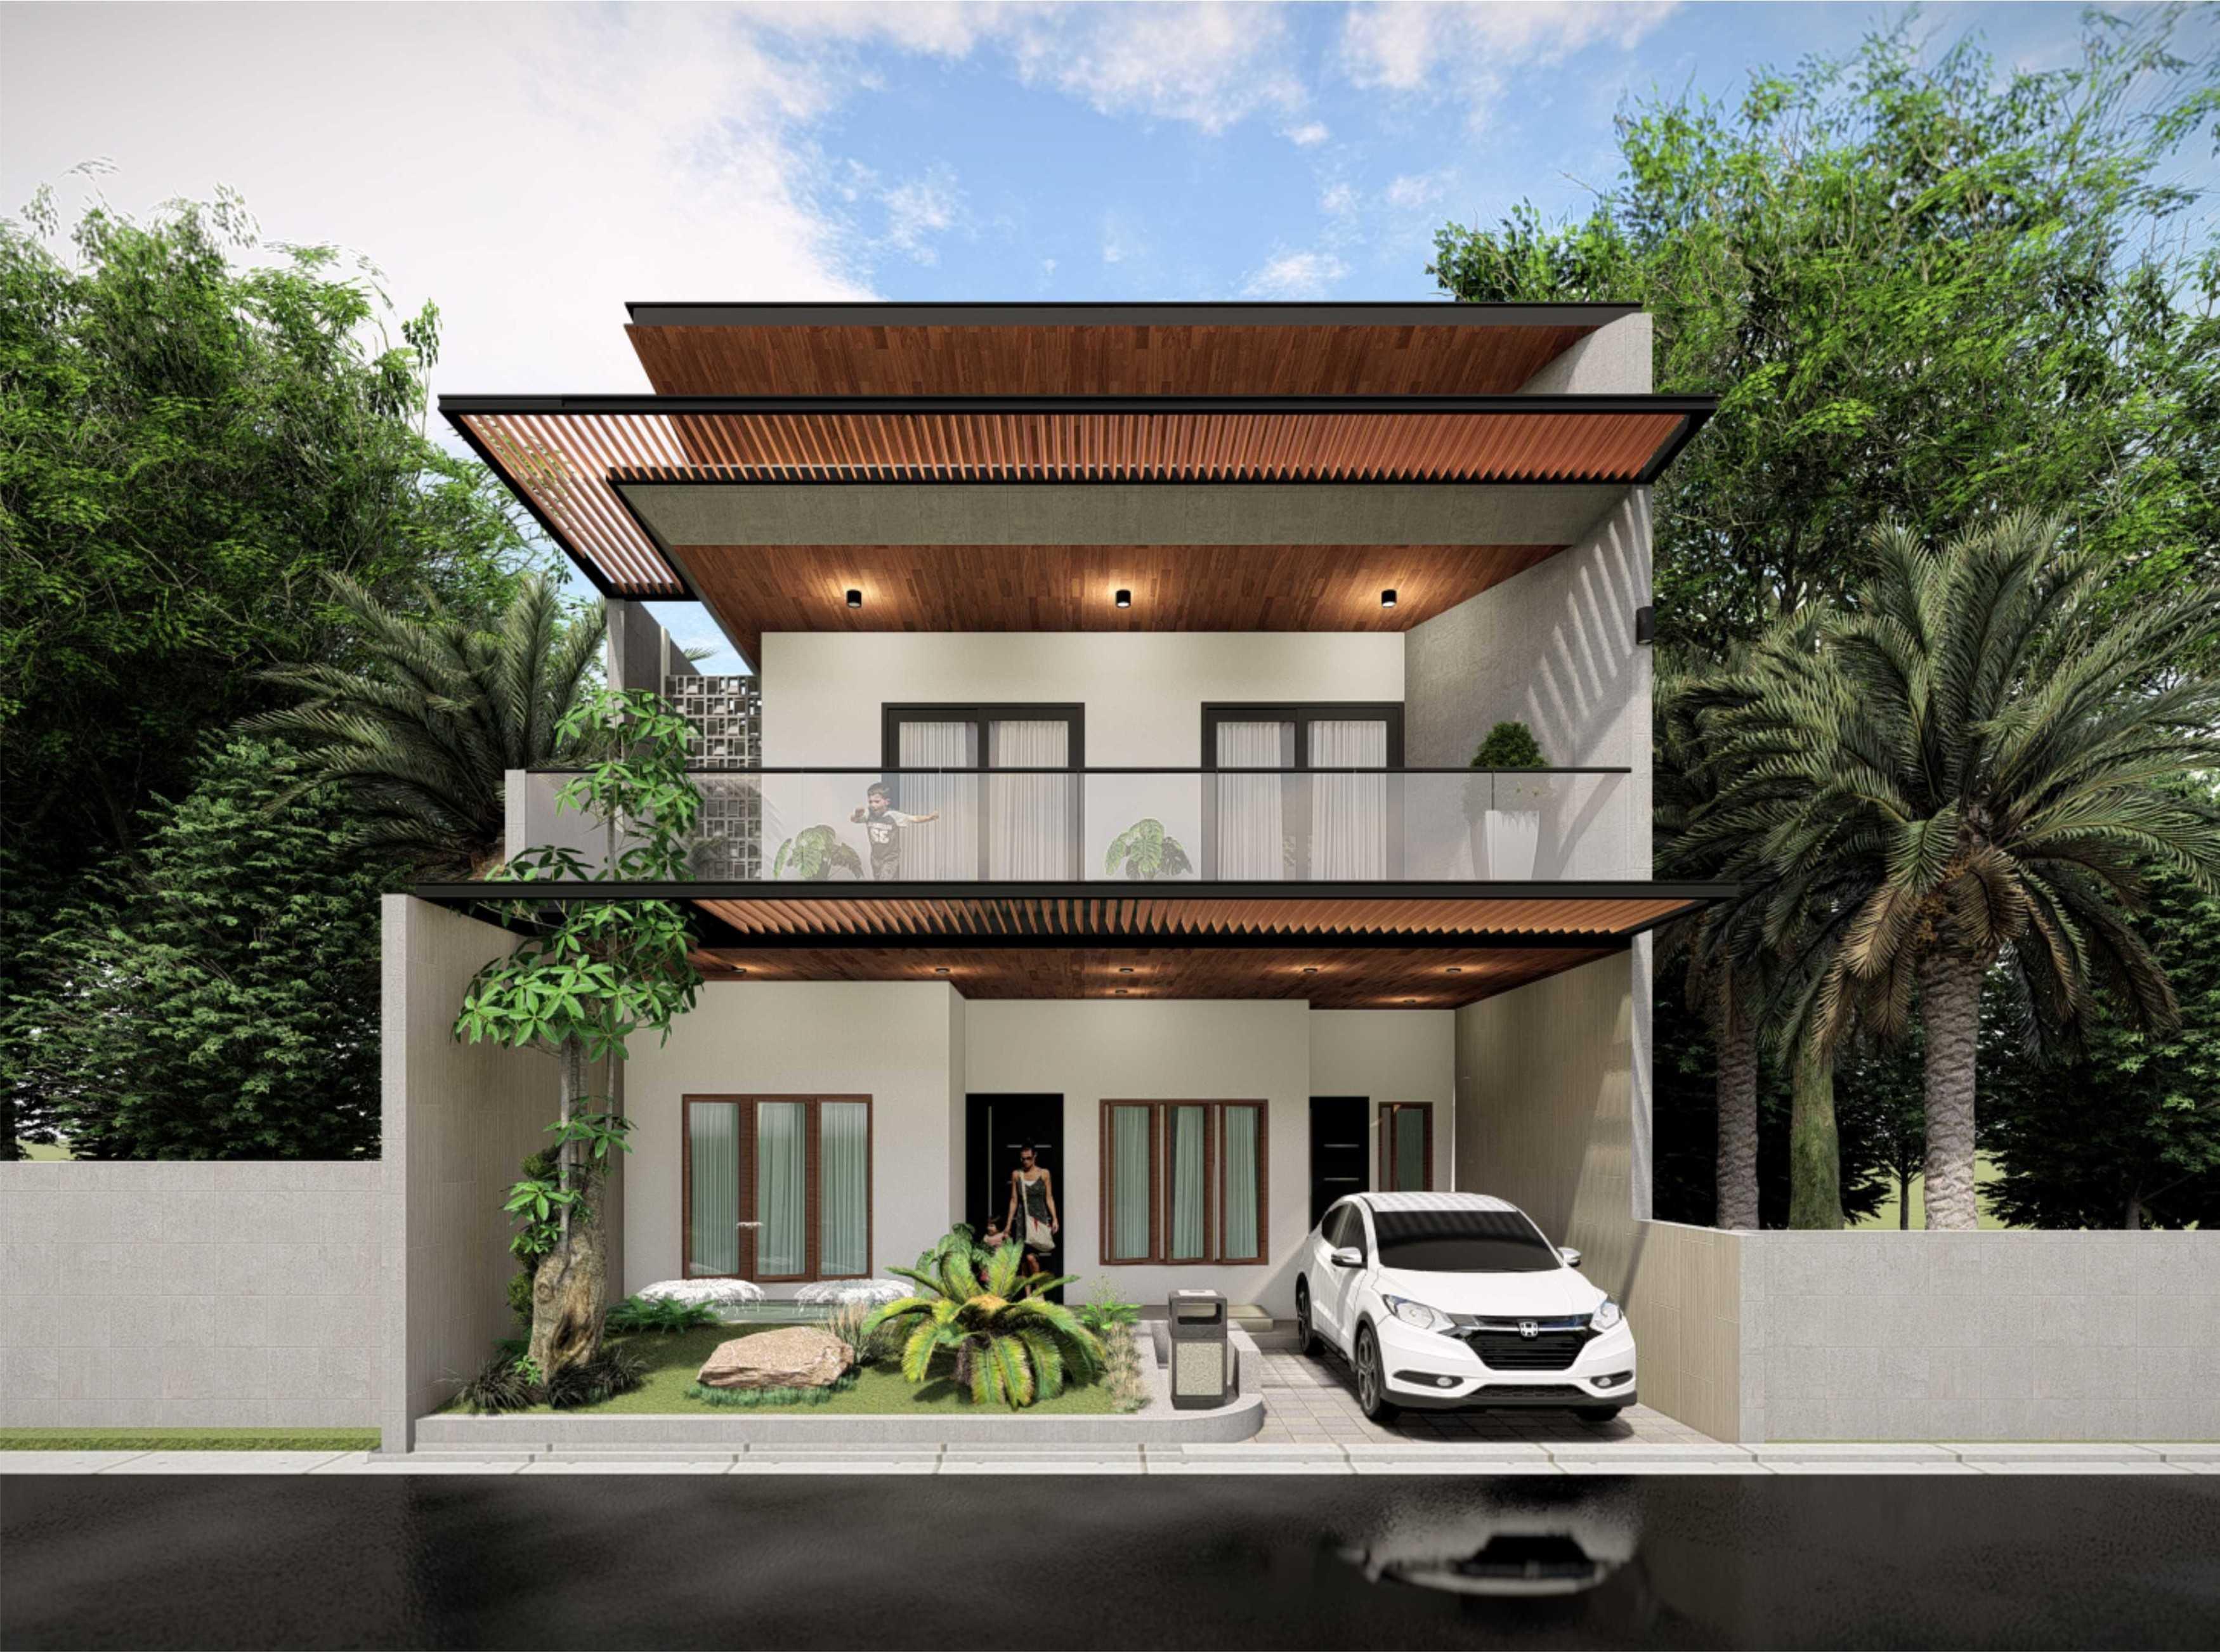 Ikigai Arsitama A R House Kota Depok, Jawa Barat, Indonesia Kota Depok, Jawa Barat, Indonesia Ecross-Arsitama-A-R-House   119743